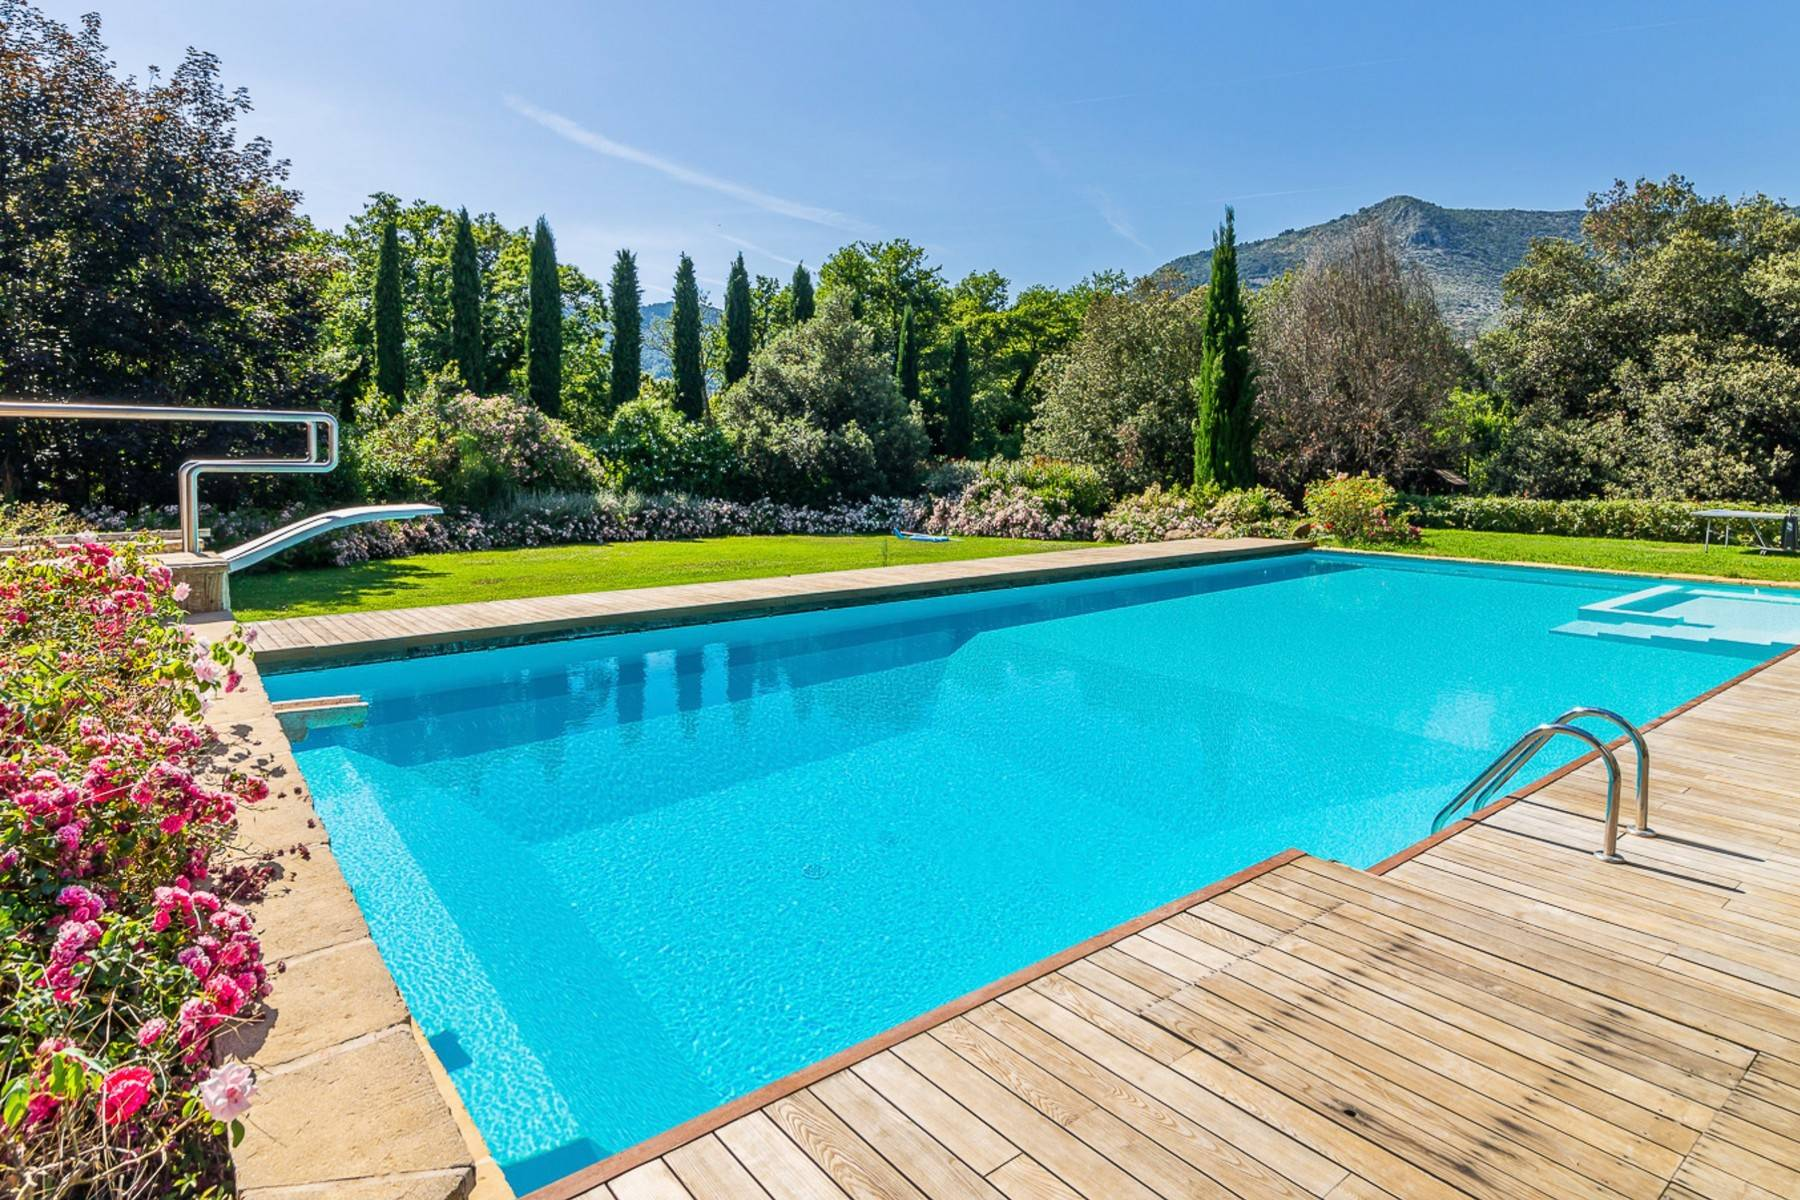 Villa in Vendita a Lucca: 5 locali, 1130 mq - Foto 30